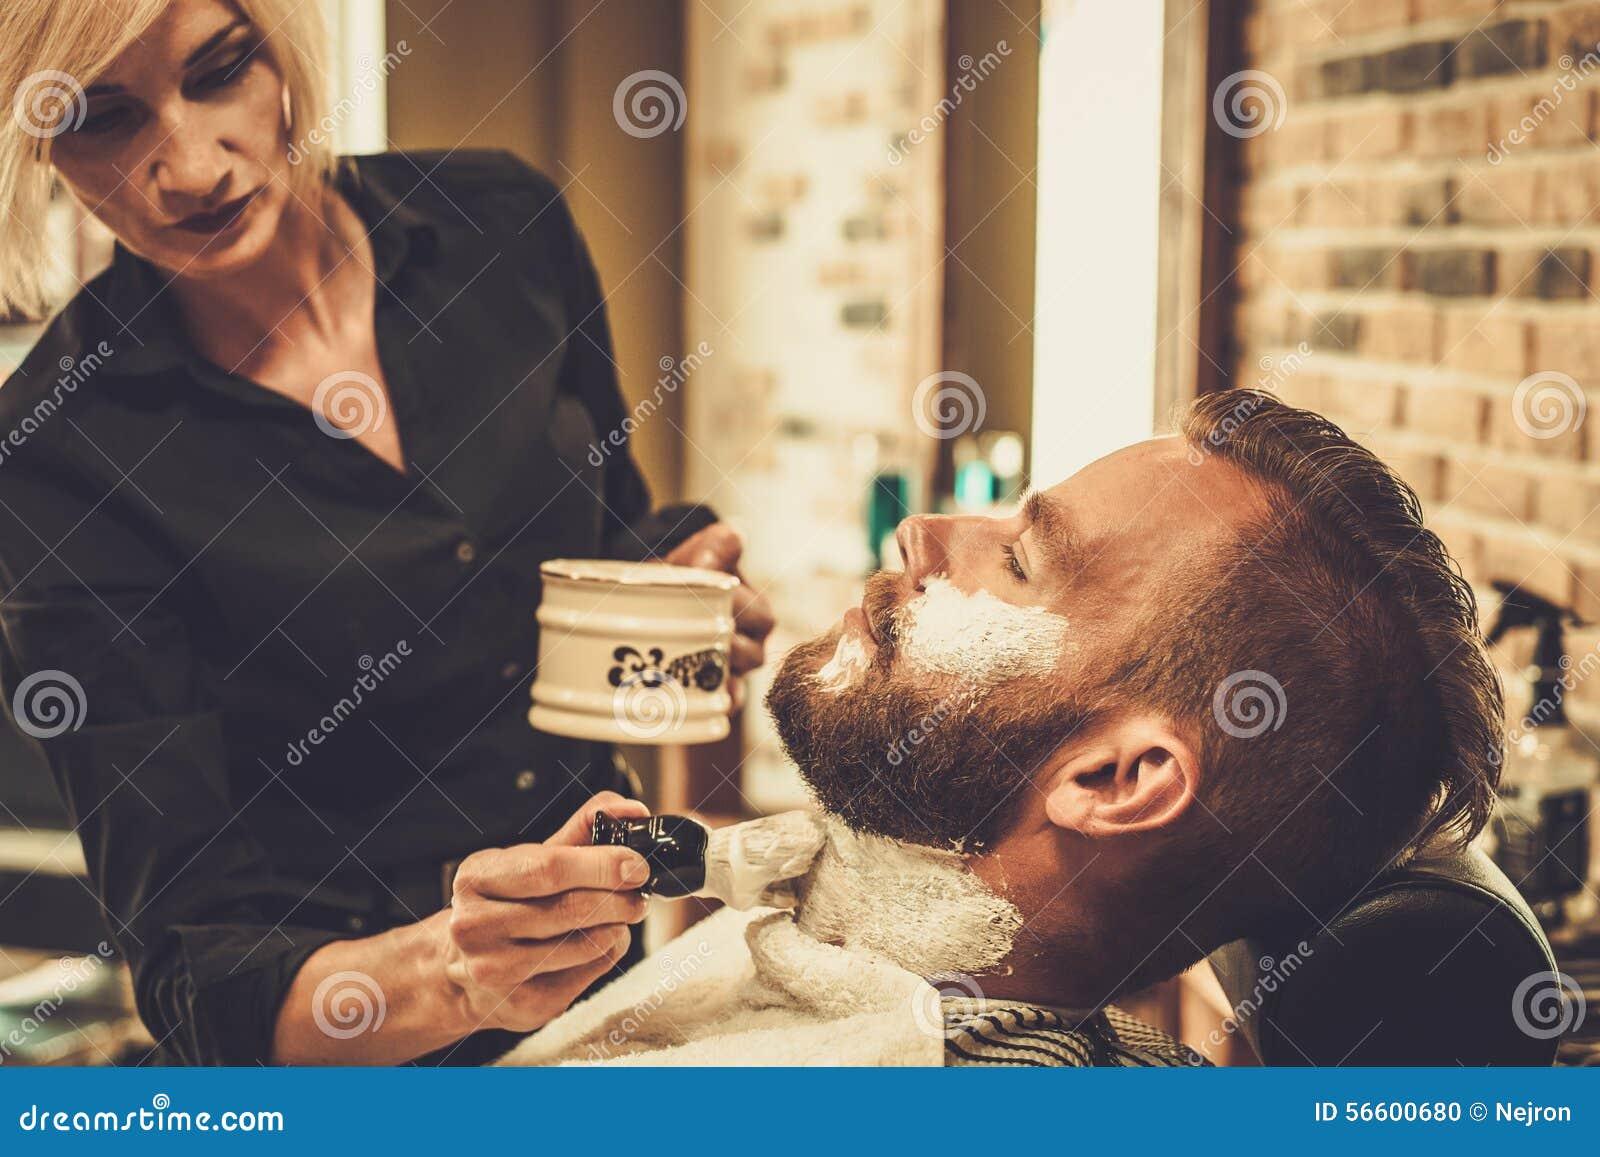 client during beard shaving stock photo image 56600680. Black Bedroom Furniture Sets. Home Design Ideas